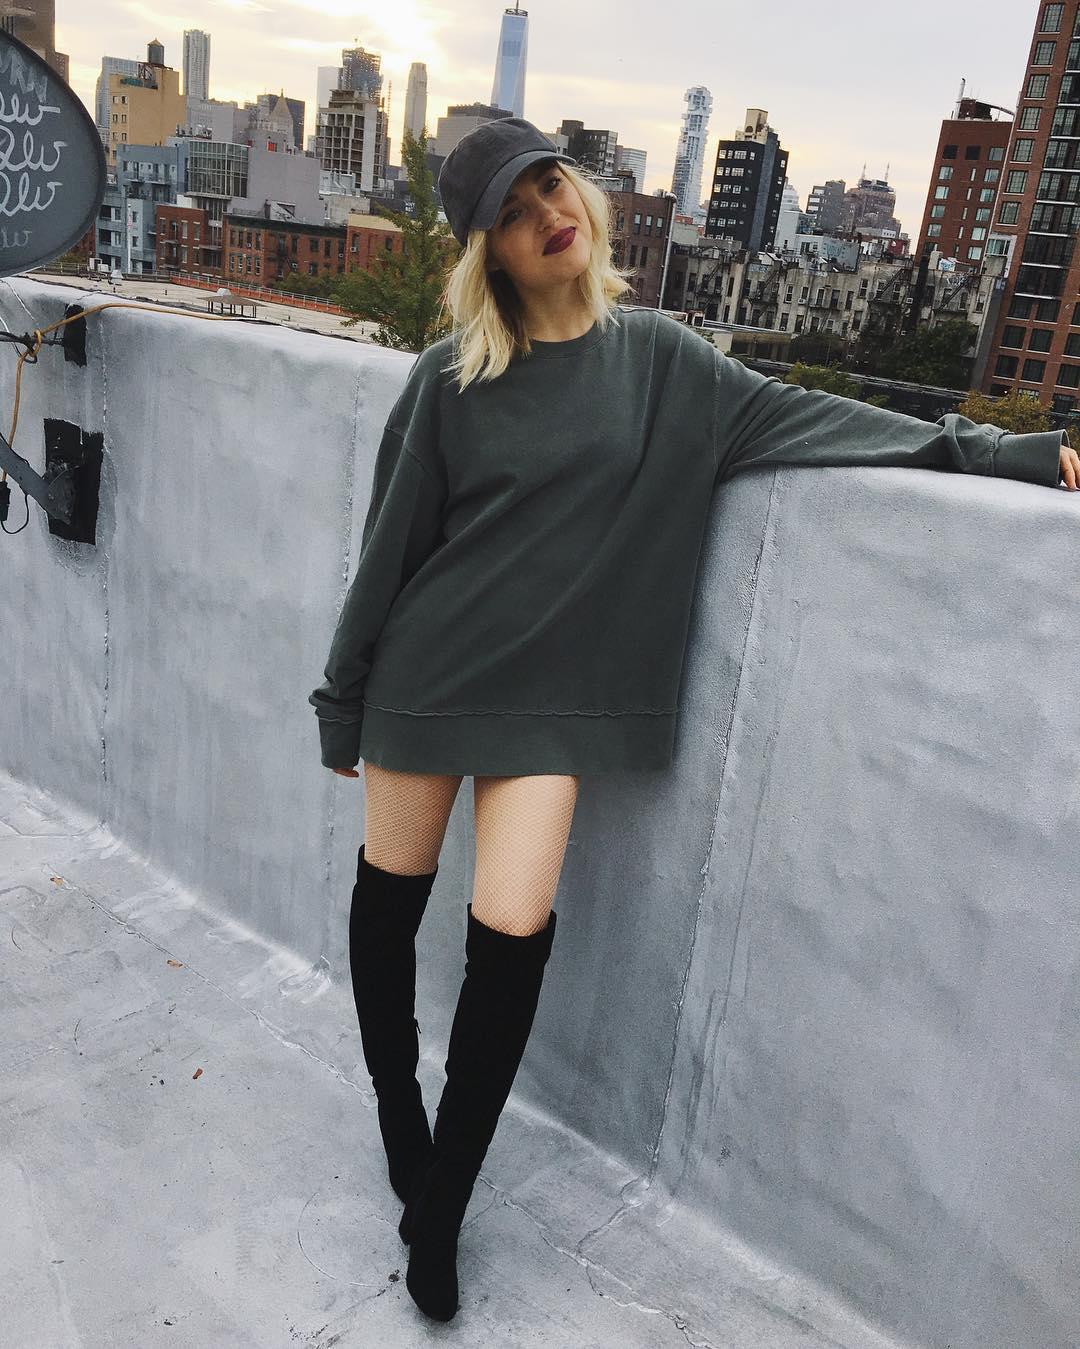 Anna Wintour Yeezy Costume Instagram Photos